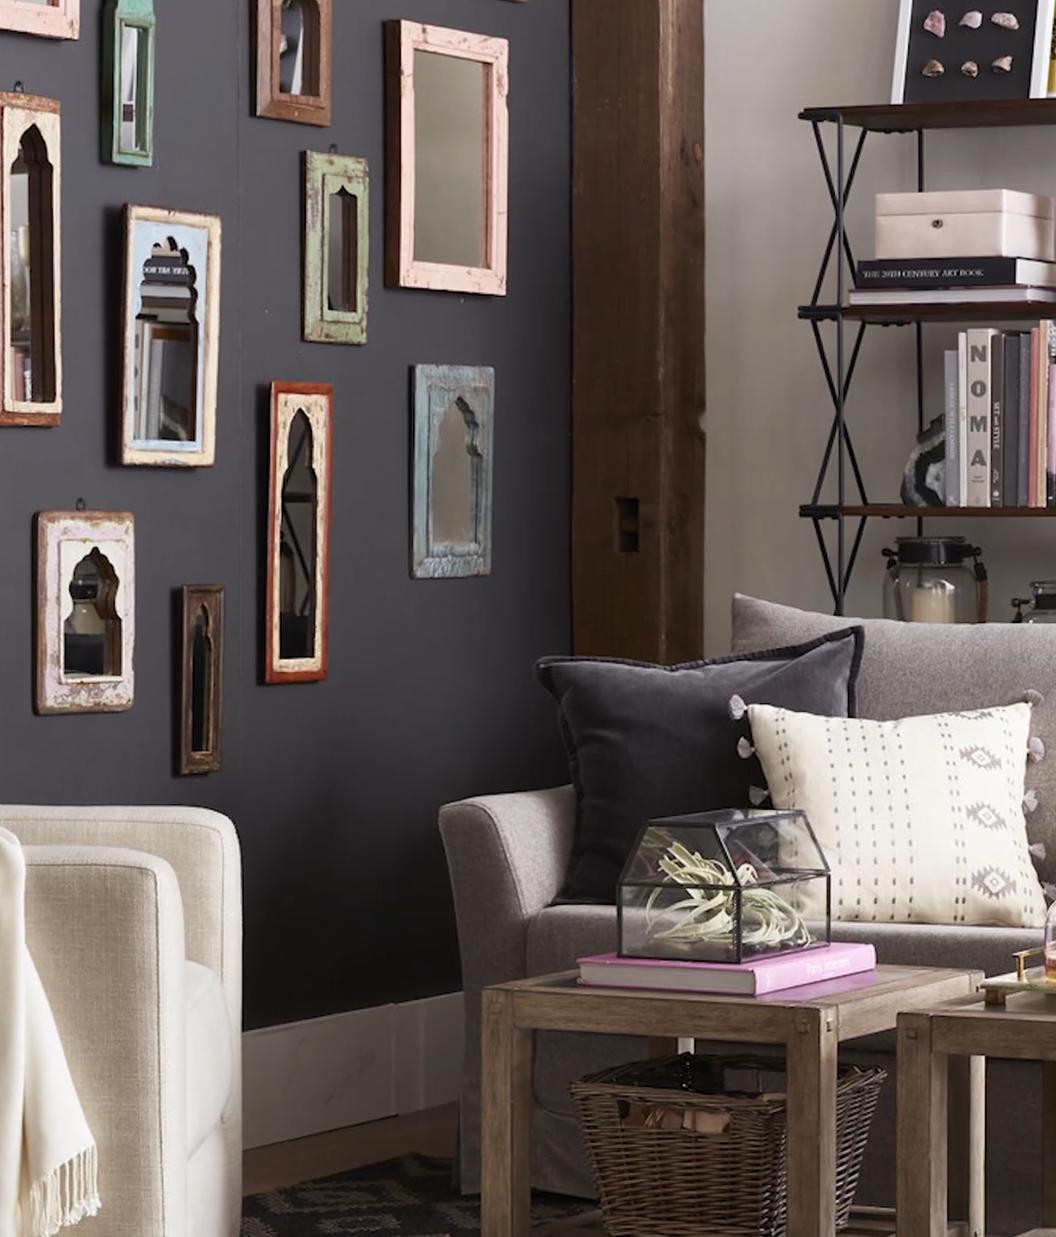 10 Pottery Barn Living Room Decorating Ideas